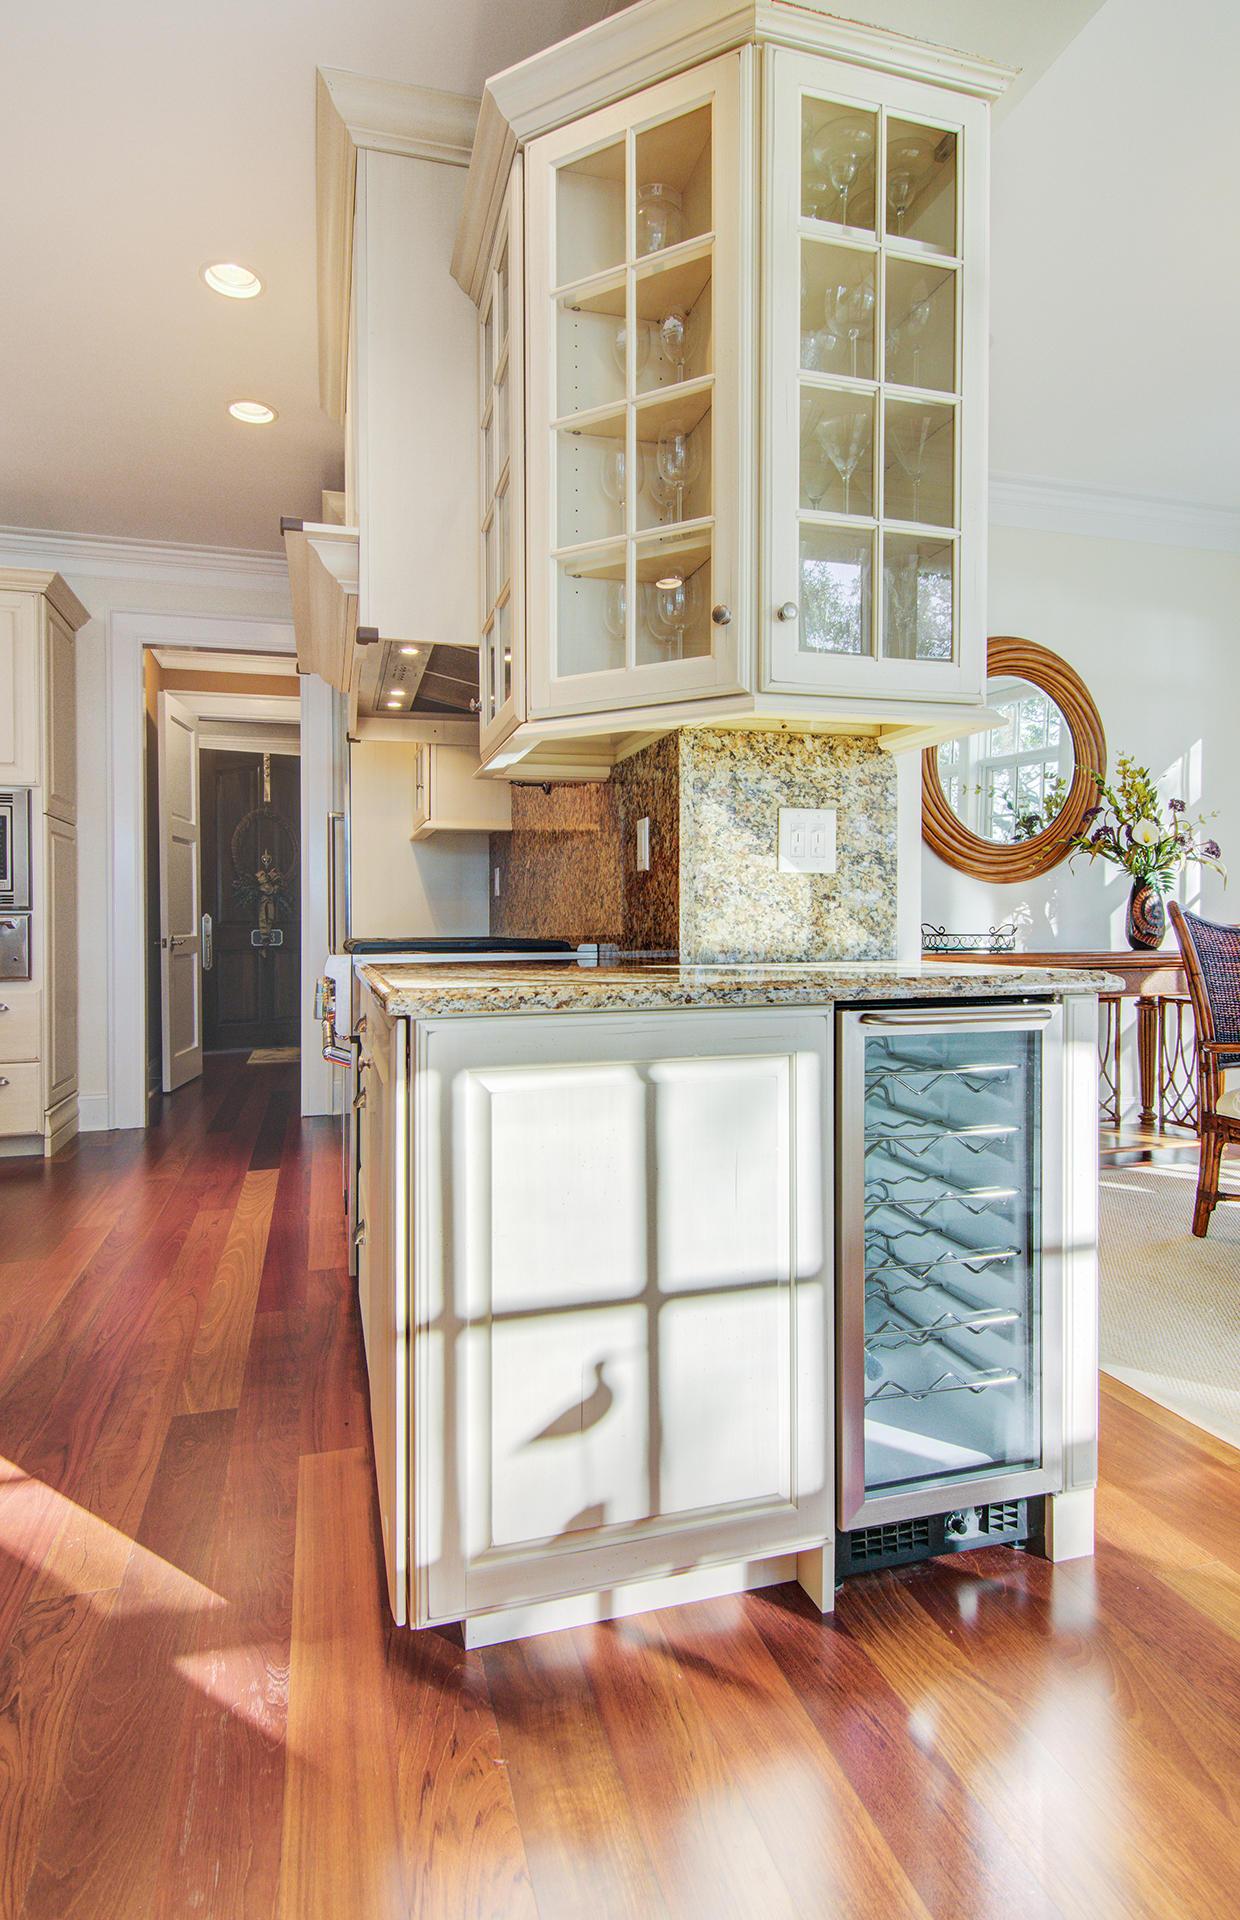 Daniel Island Homes For Sale - 134 Fairbanks Oak, Charleston, SC - 40